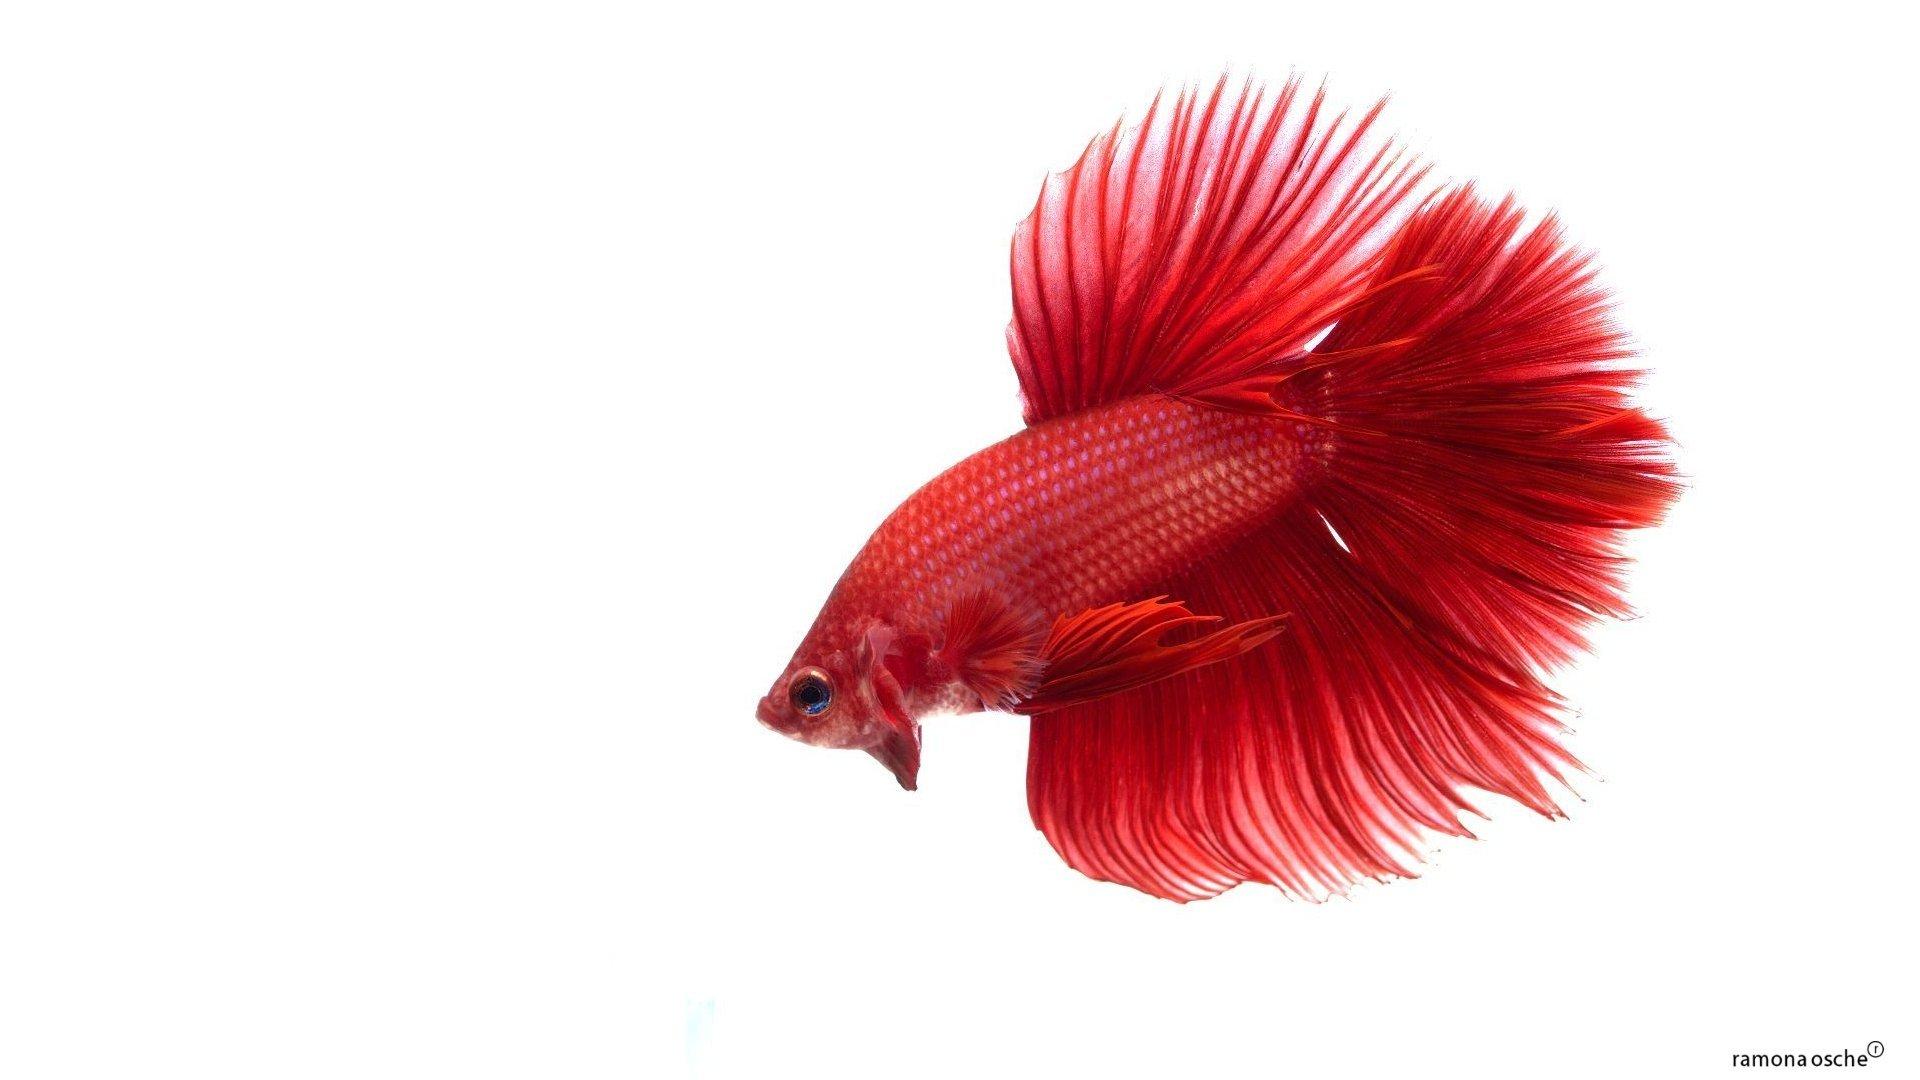 Fighter Fish Hd Wallpaper Download Betta Siamese Fighting Fish Colorful Tropical Wallpaper